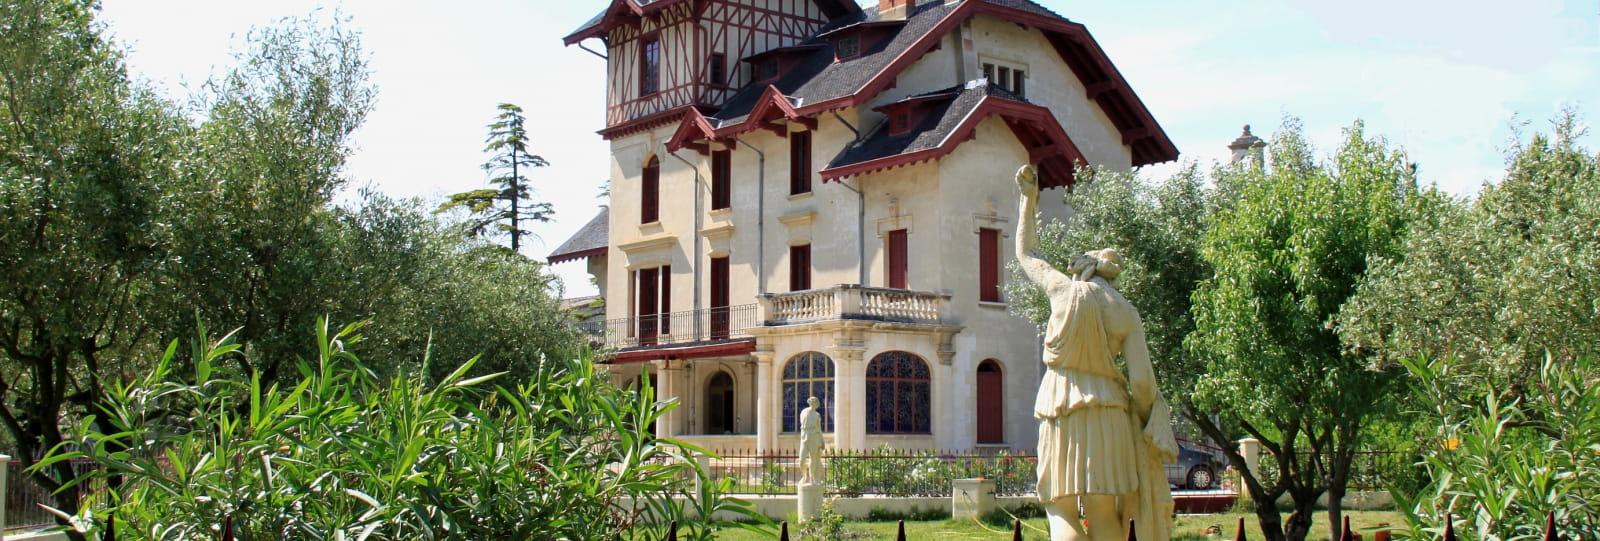 Visite de la Villa Sestier